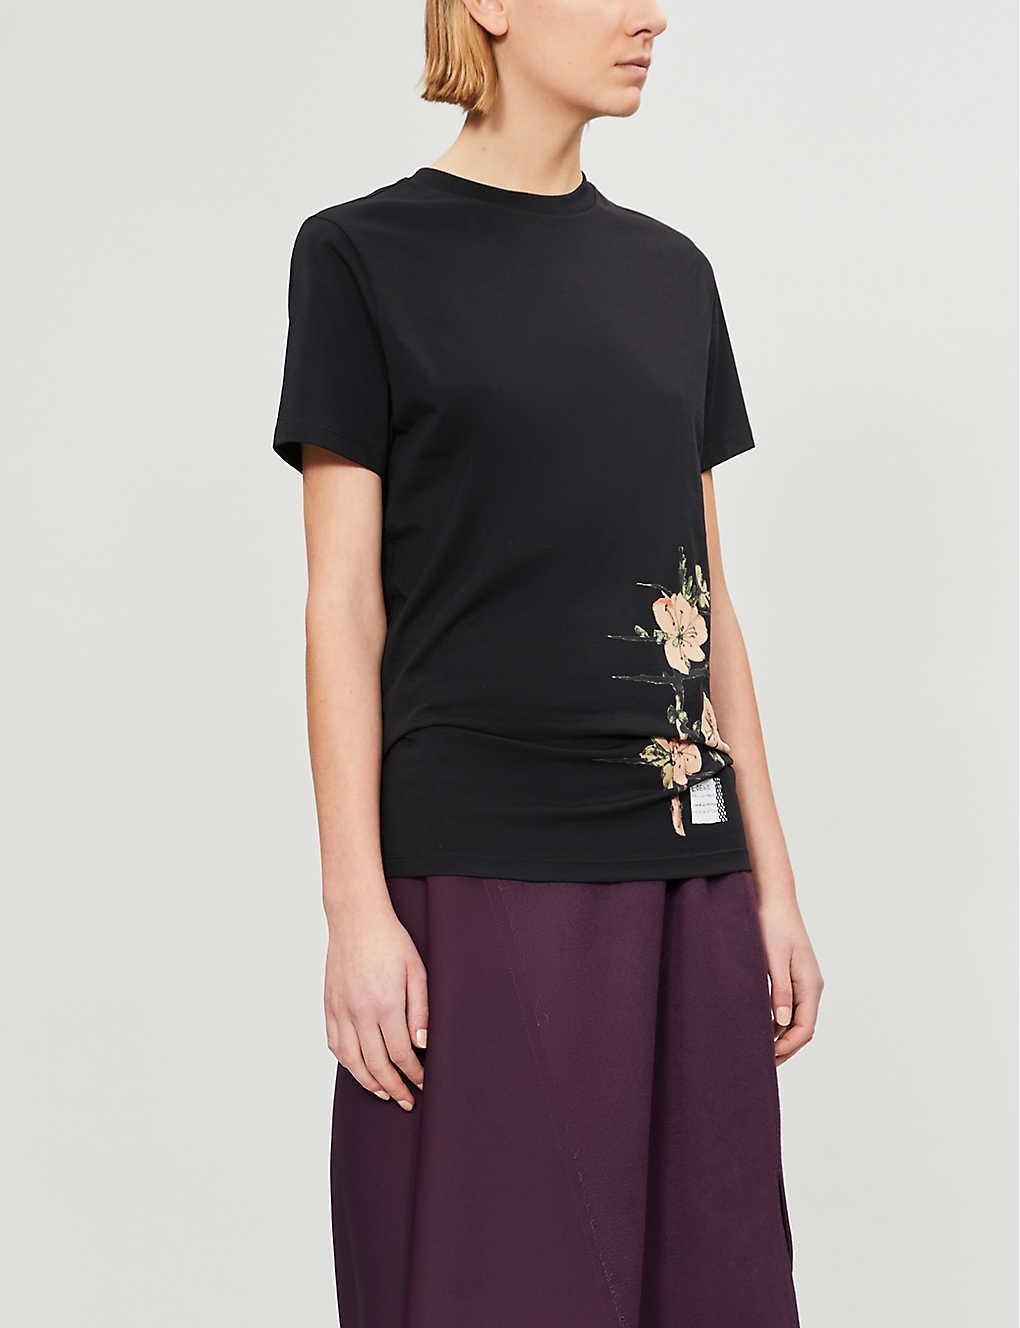 size 40 262b0 a98f1 LOEWE - Mackintosh cotton-jersey T-shirt | Selfridges.com